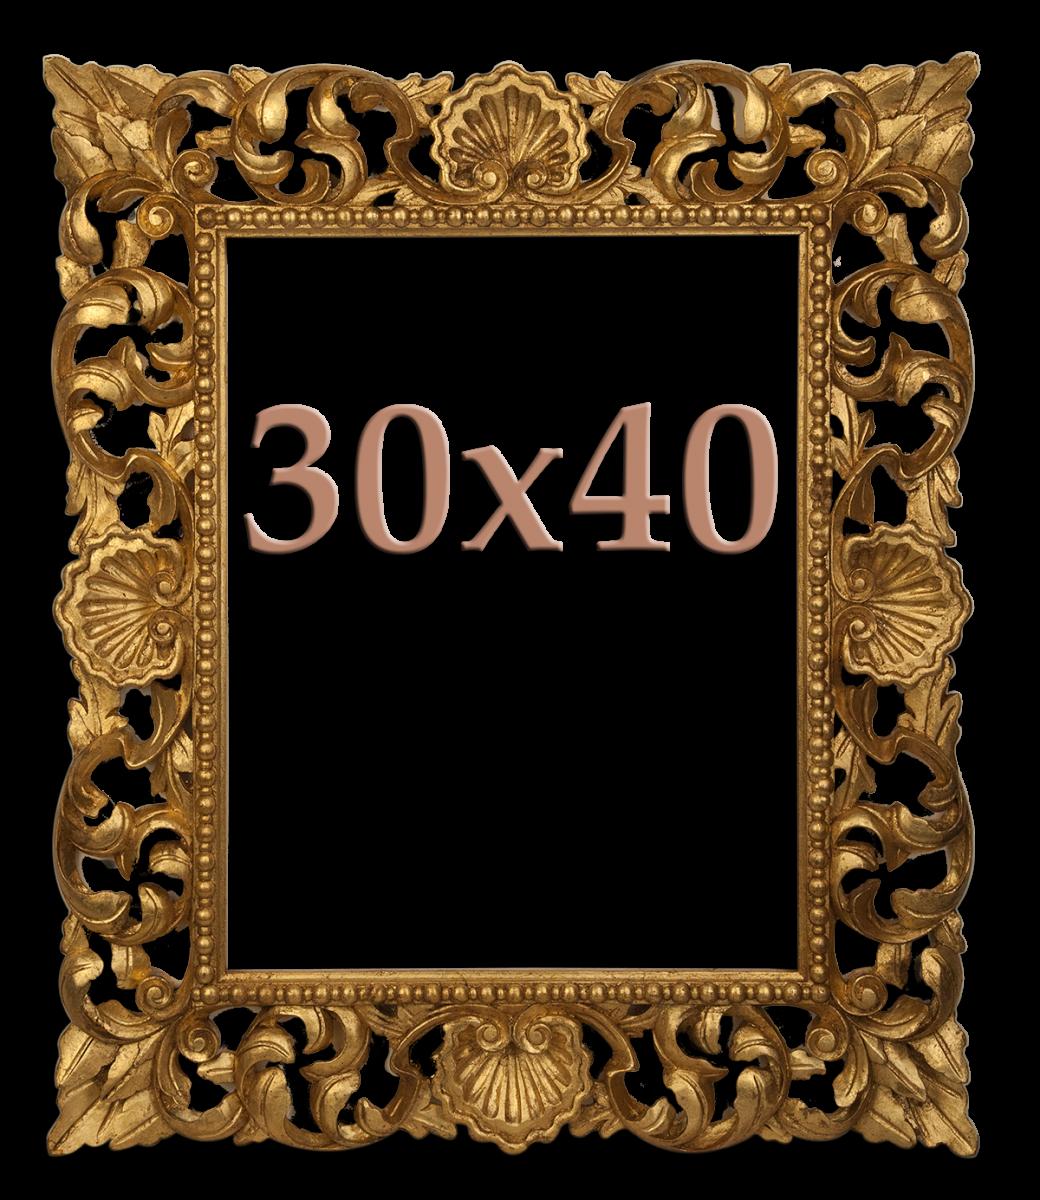 30x40